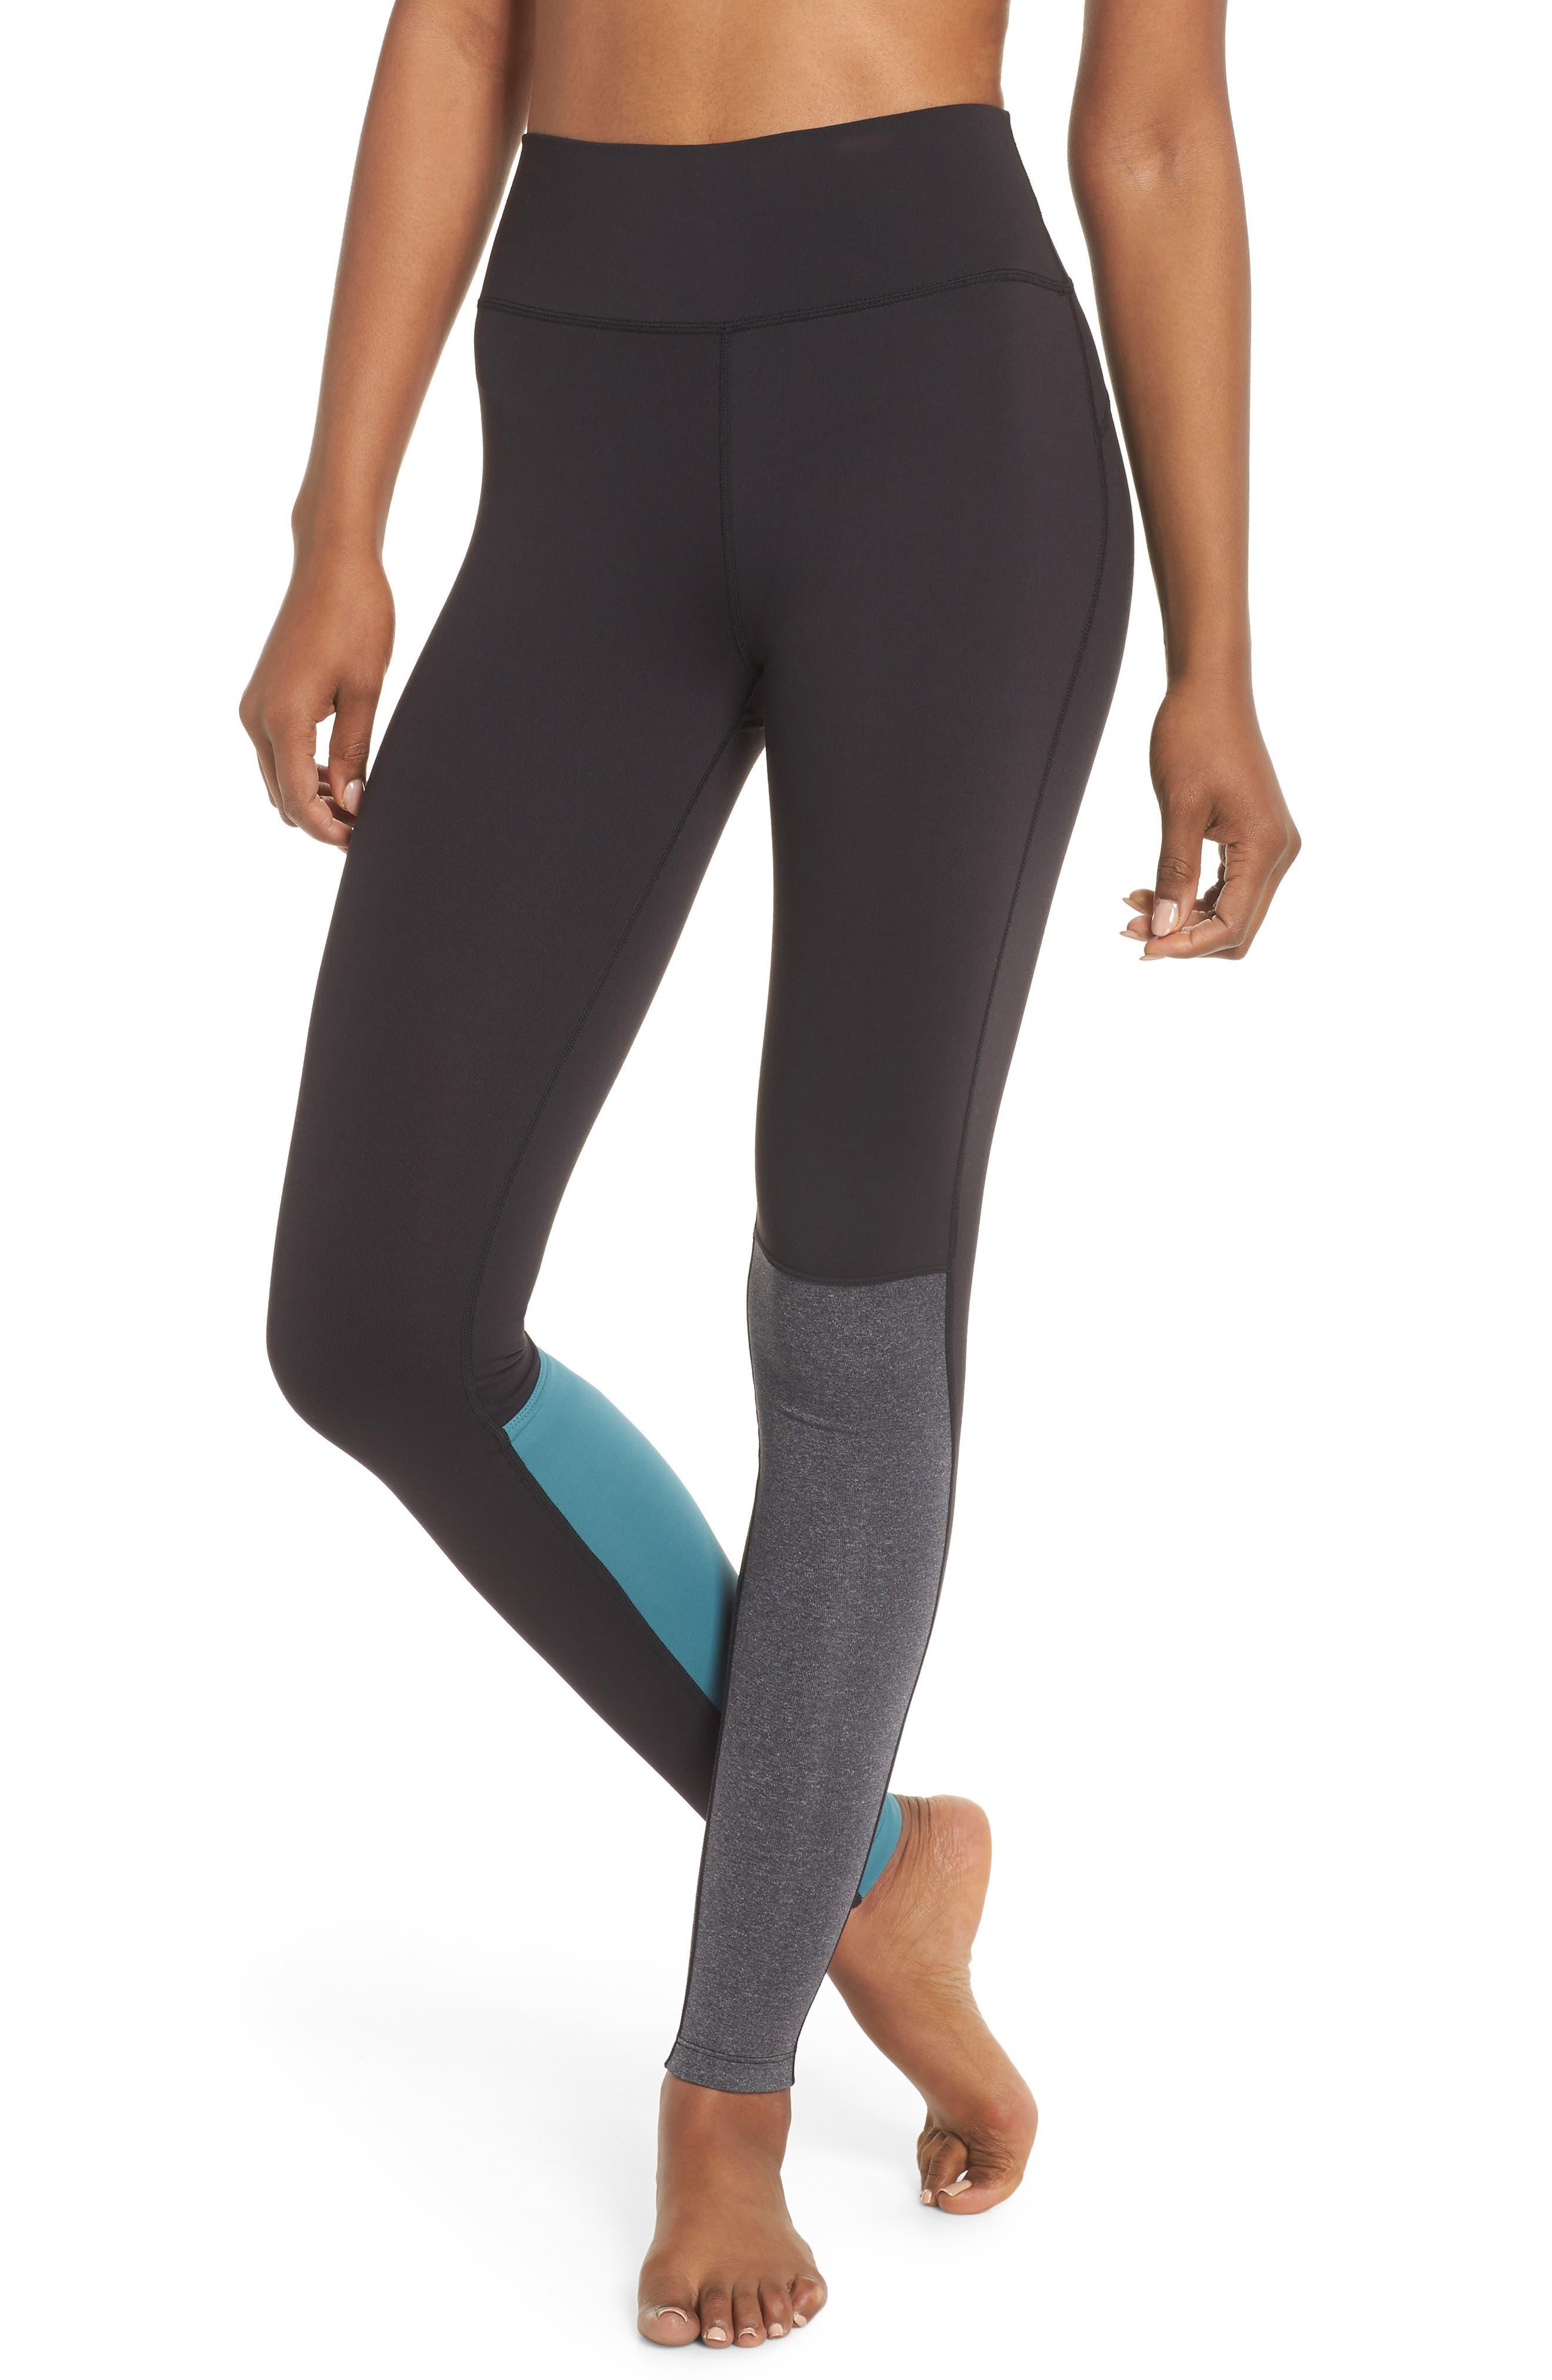 Flash Leggings,                         Main,                         color, Black/ Heather Grey/ Blue Surf